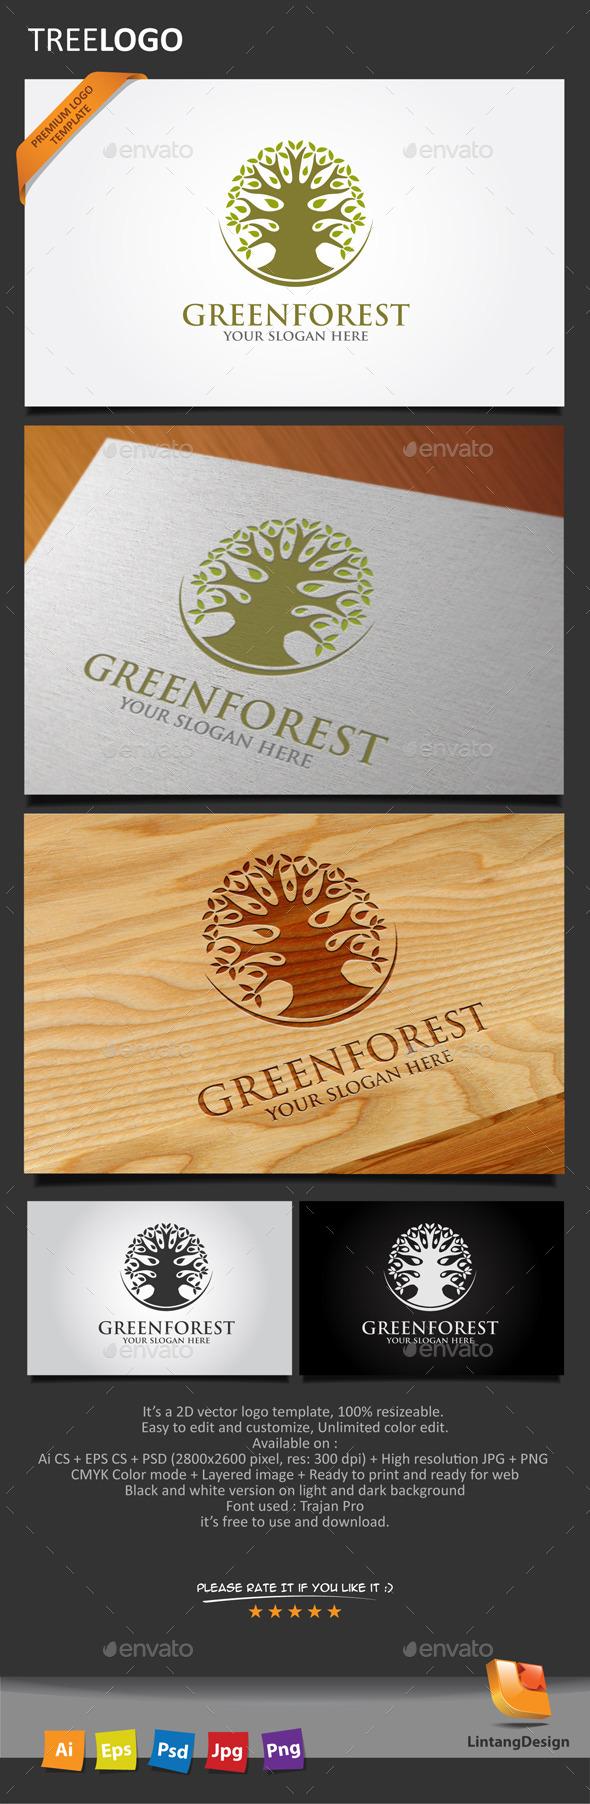 GraphicRiver Tree Logo 004 10447973